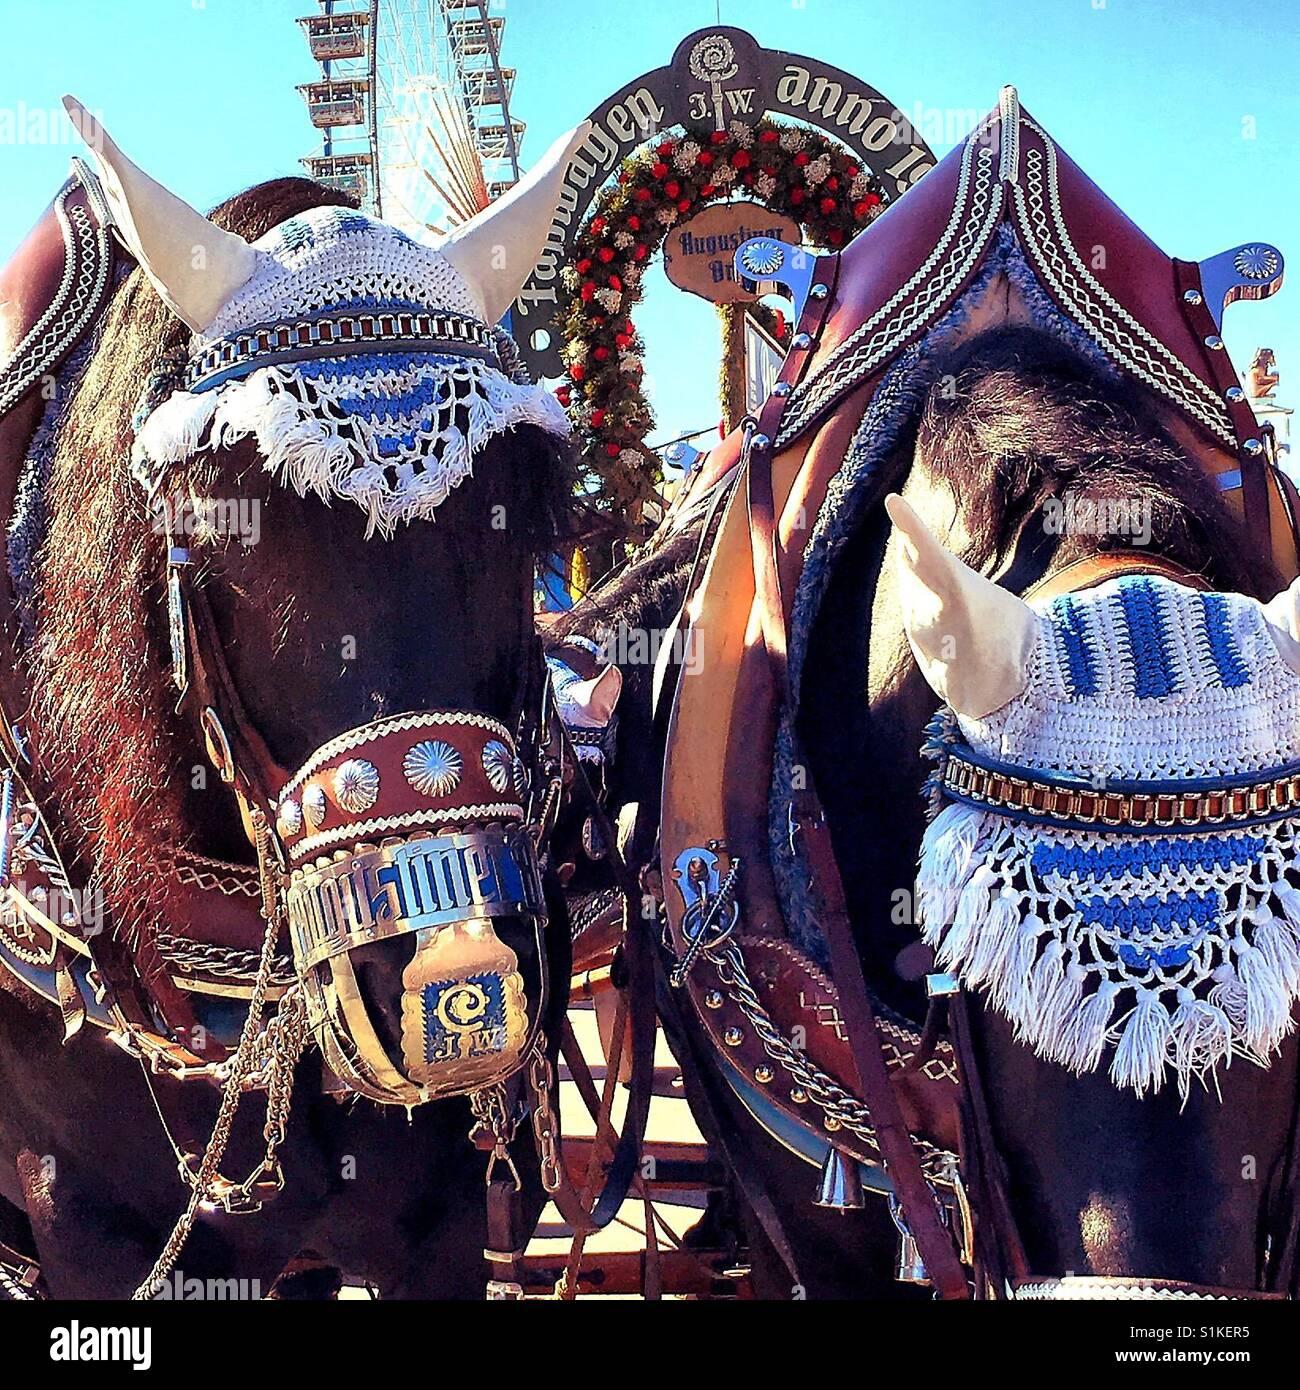 Horses at the Oktoberfest - Stock Image